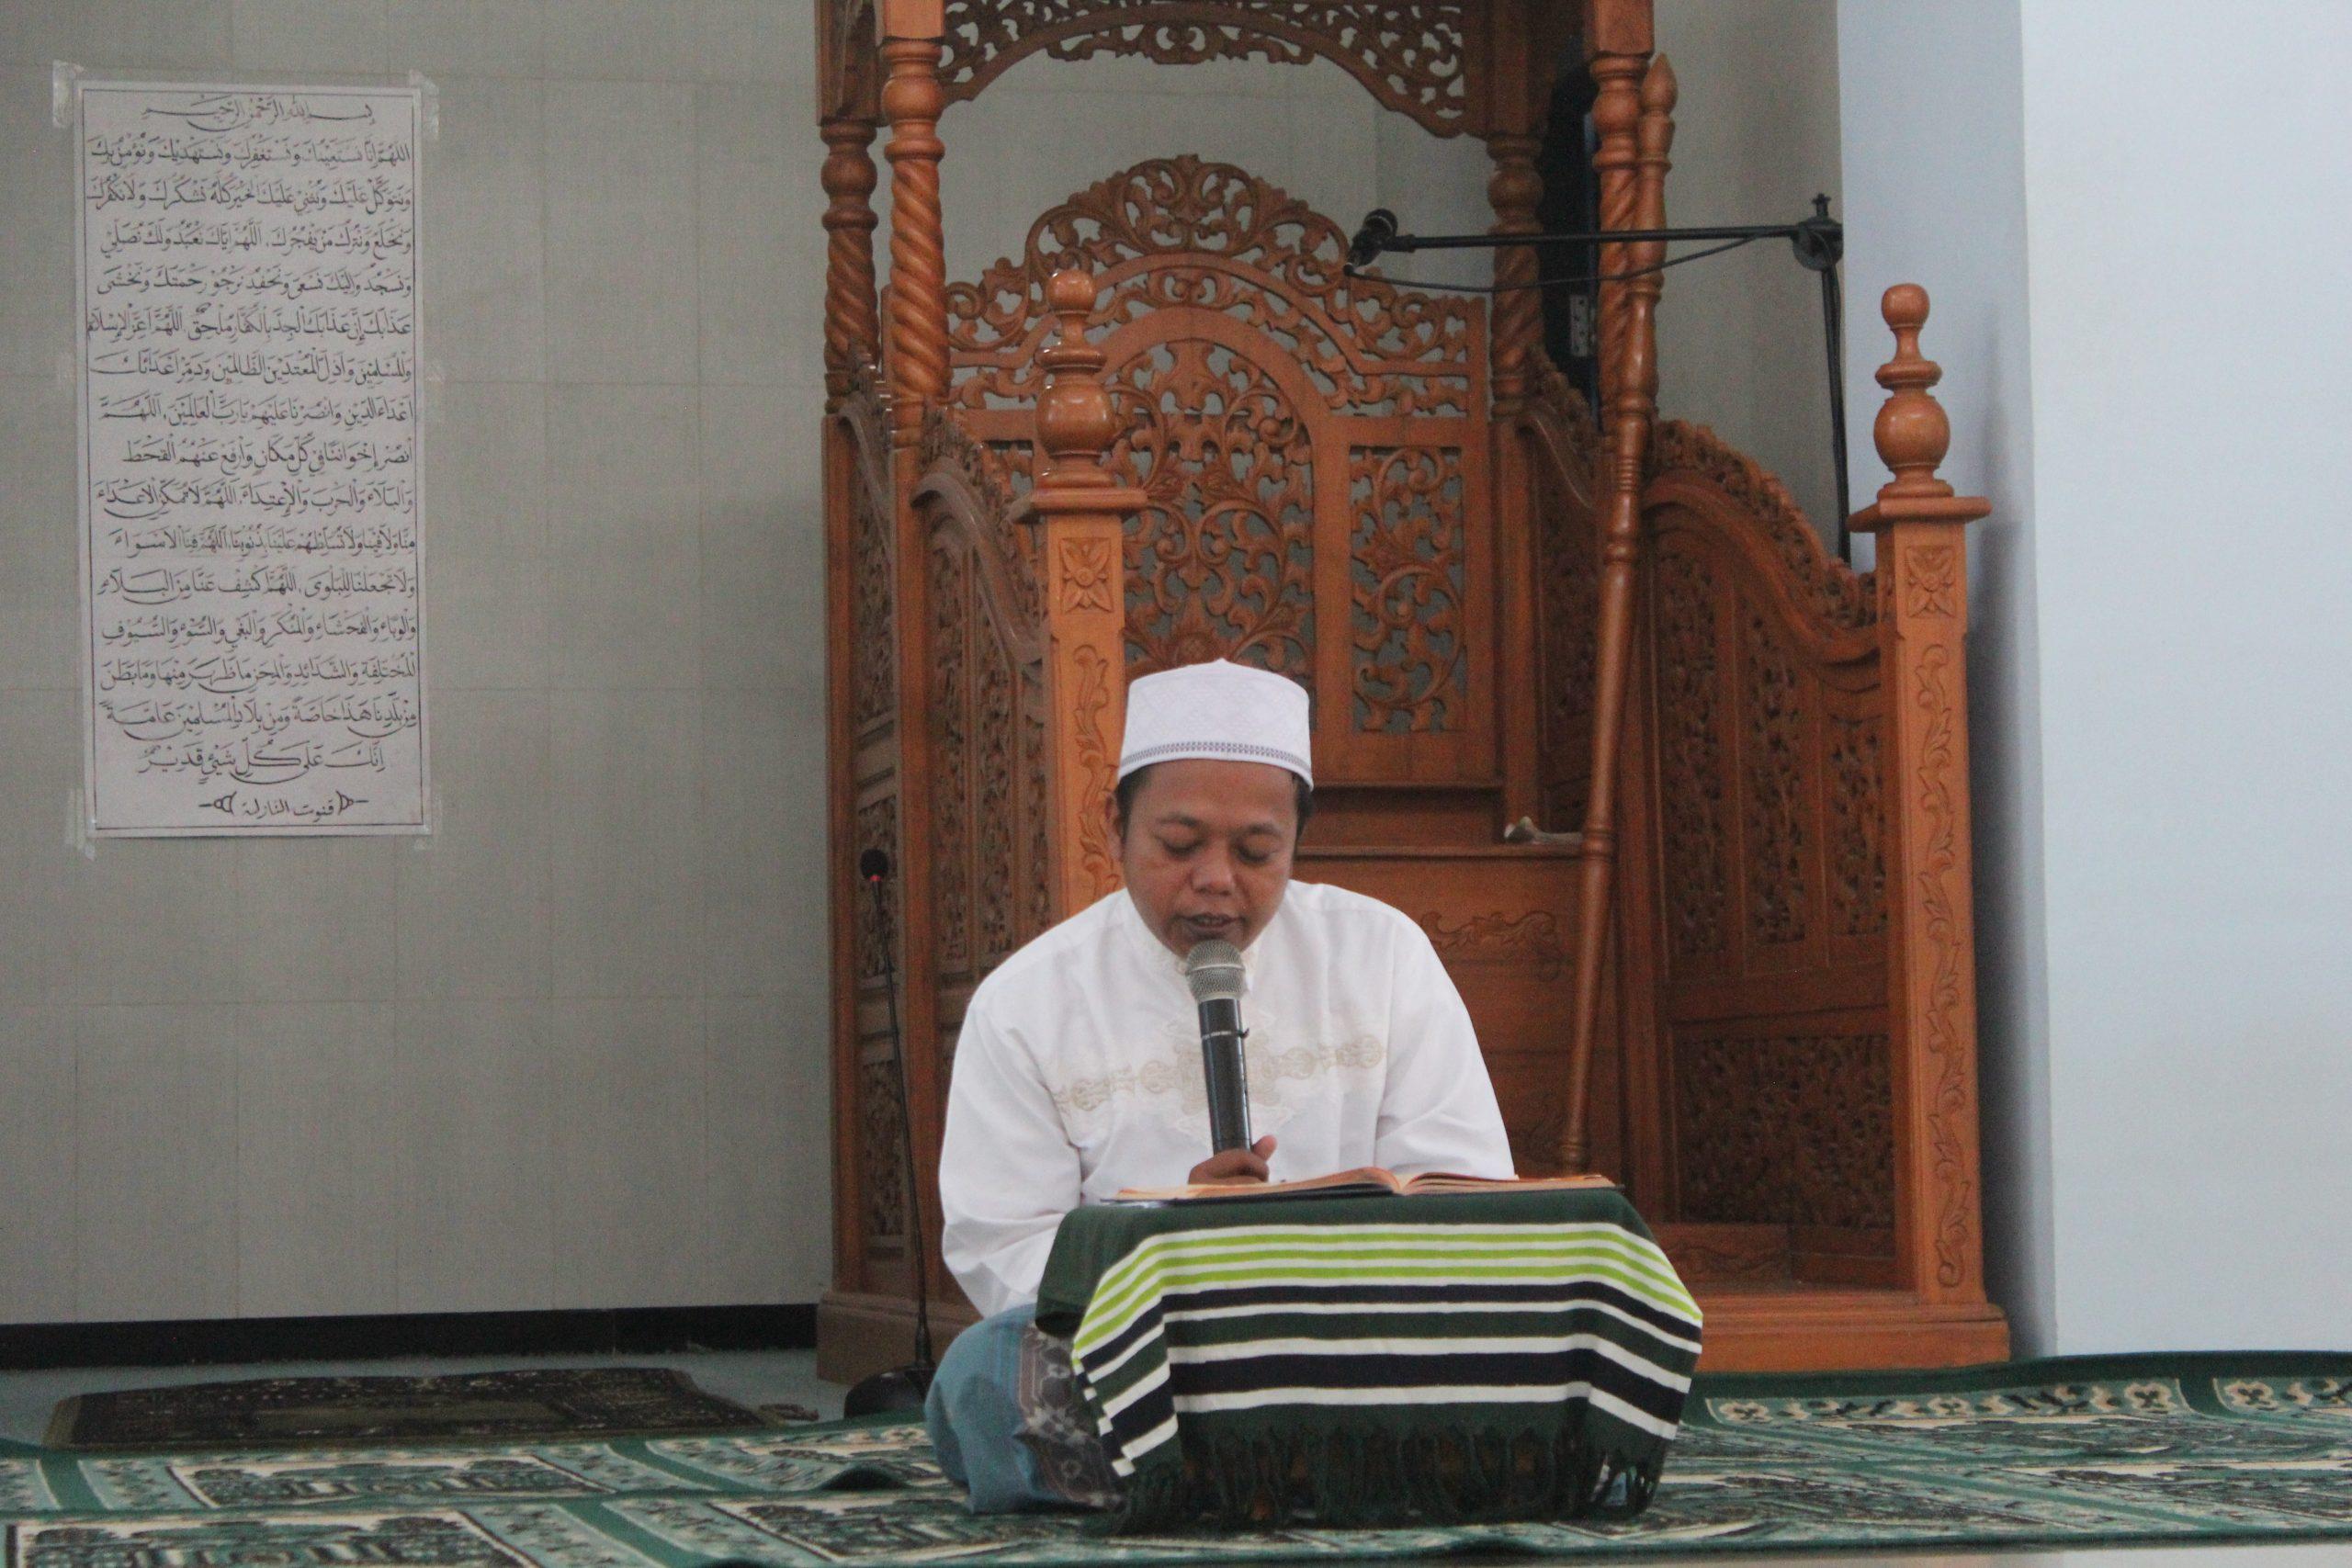 Ngaji Online Bersama Kepala Madrasah (14 Ramadhan 1441)